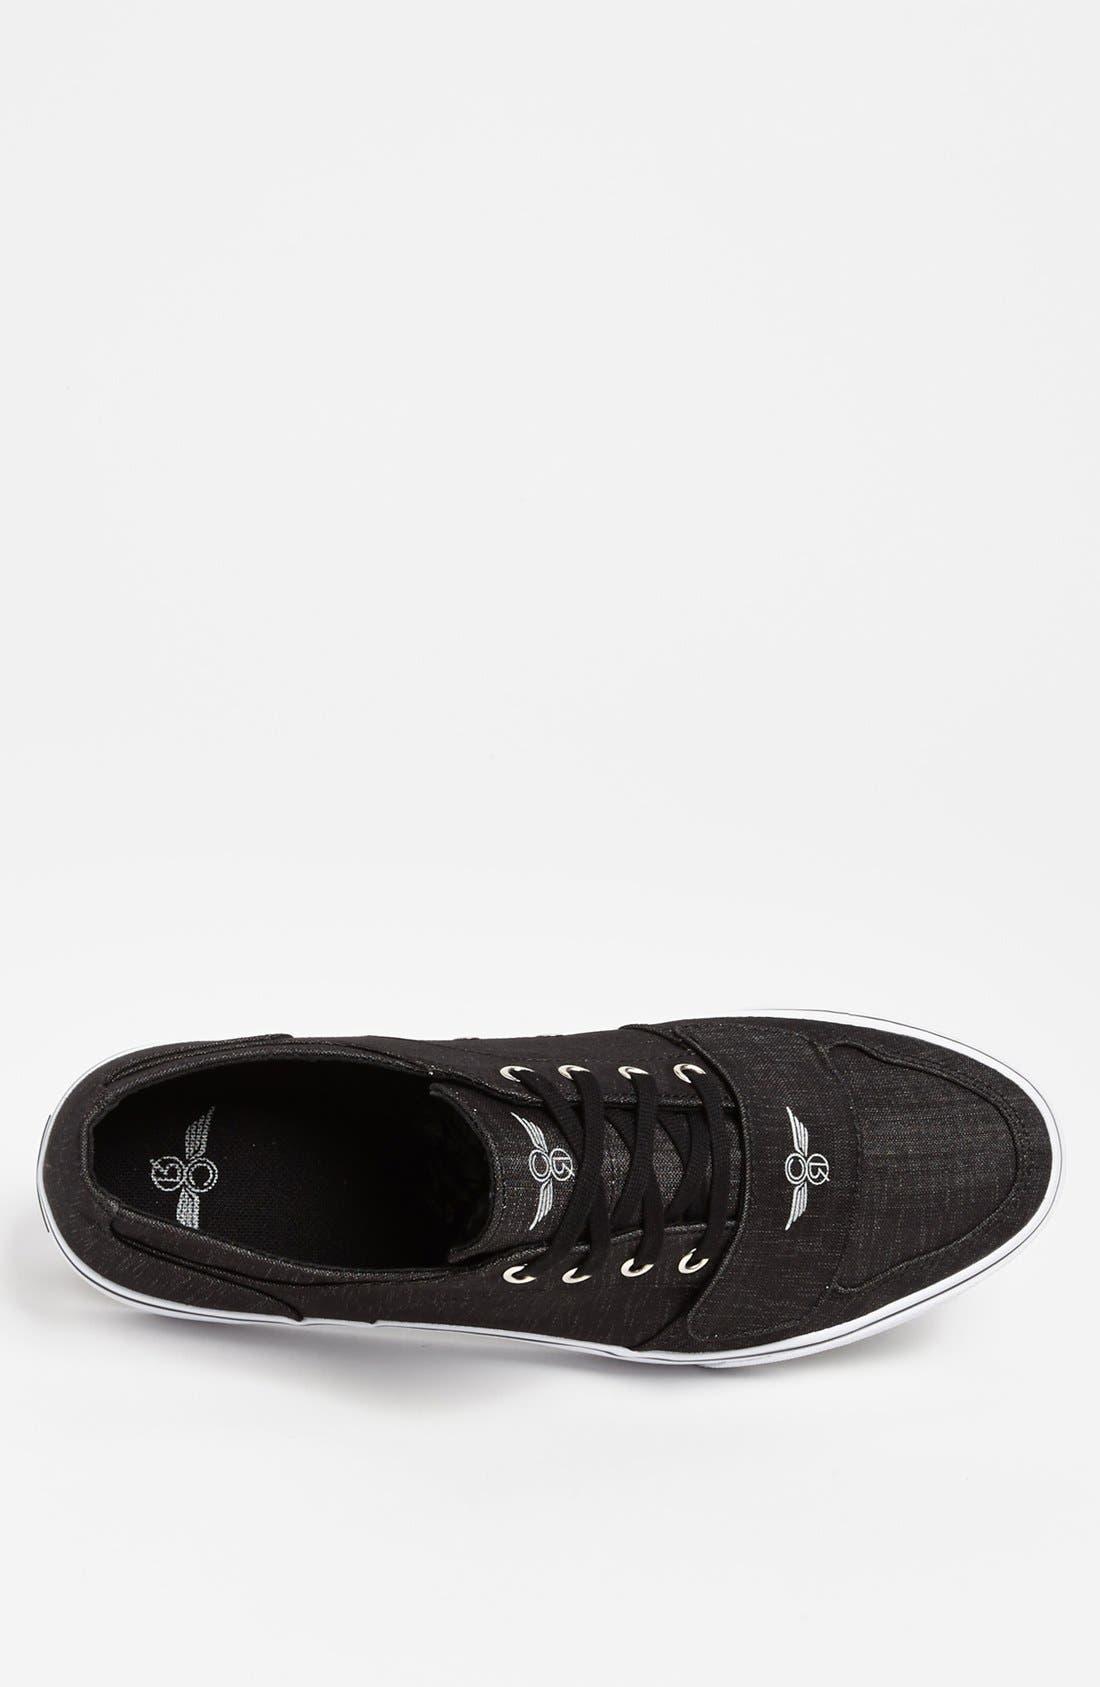 Alternate Image 3  - Creative Recreation 'Cesario Lo XVI' Sneaker (Men)